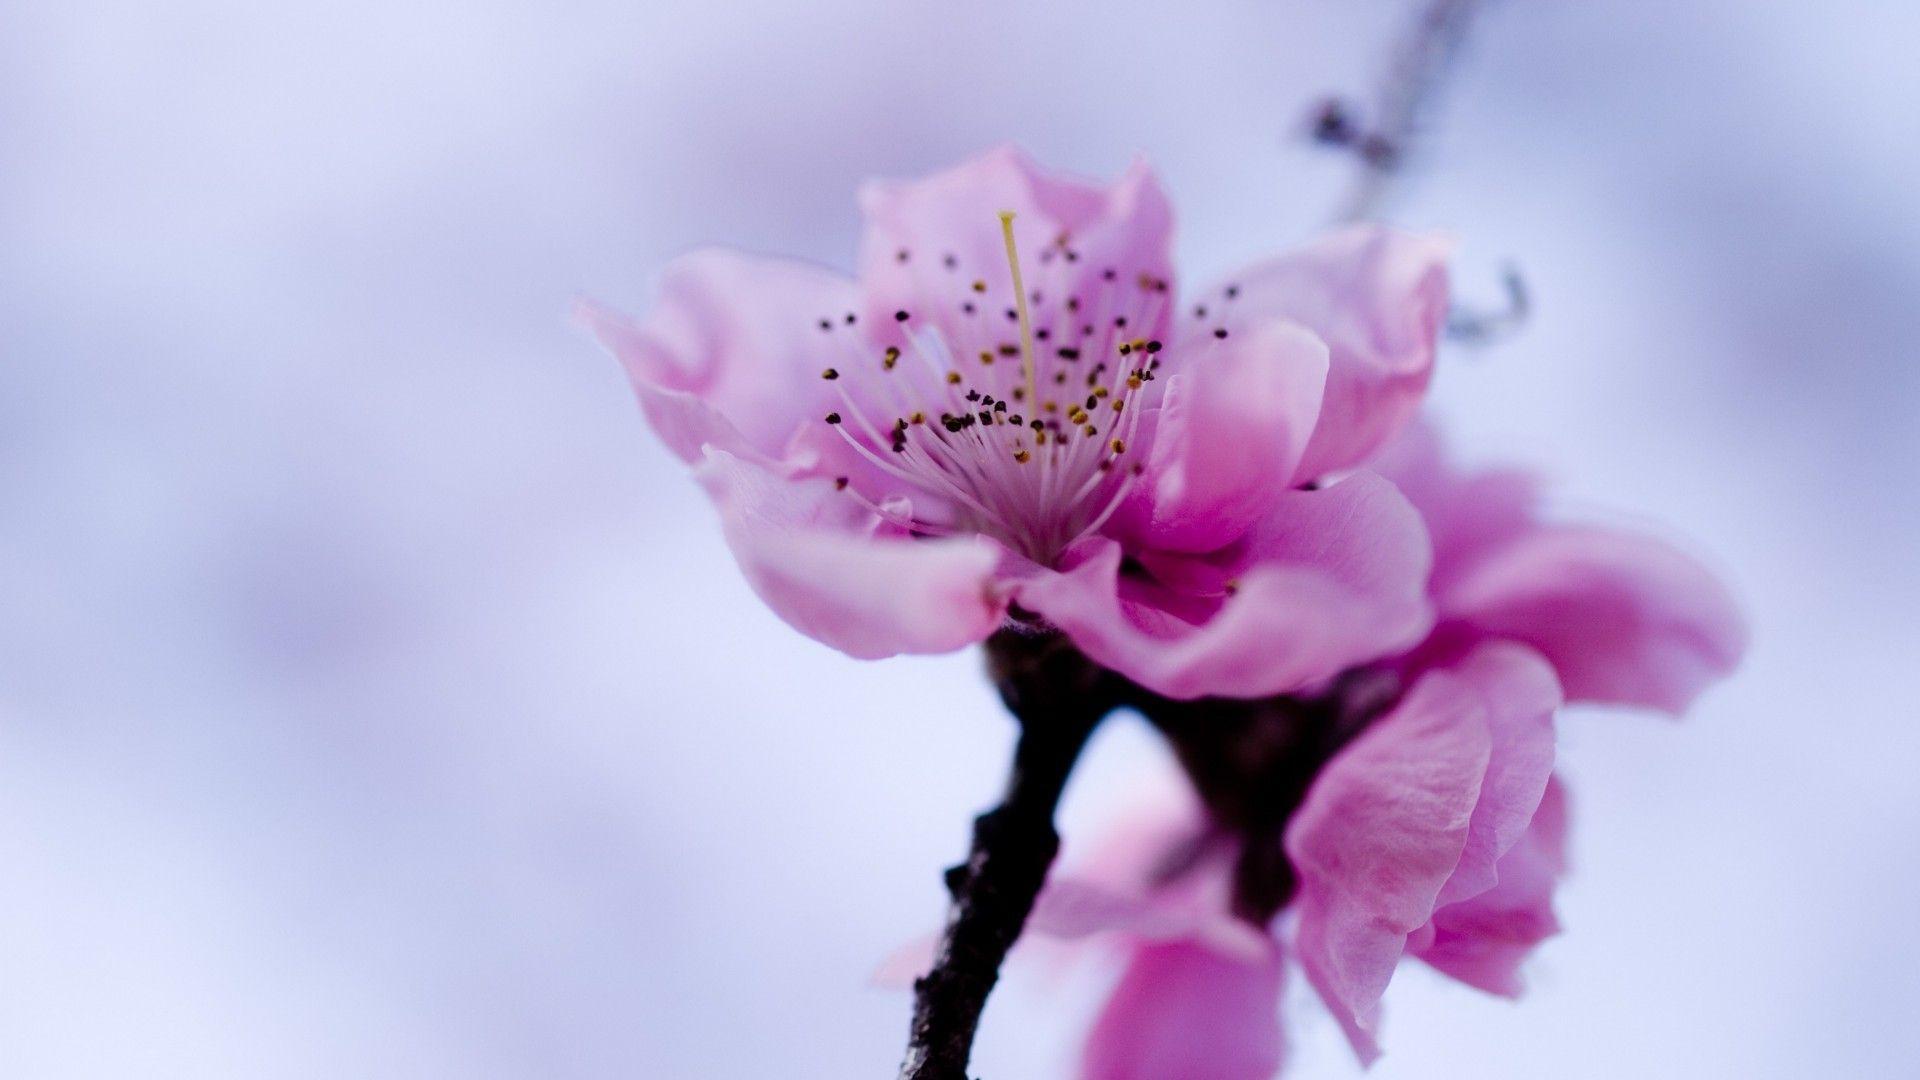 Flower Image Hd